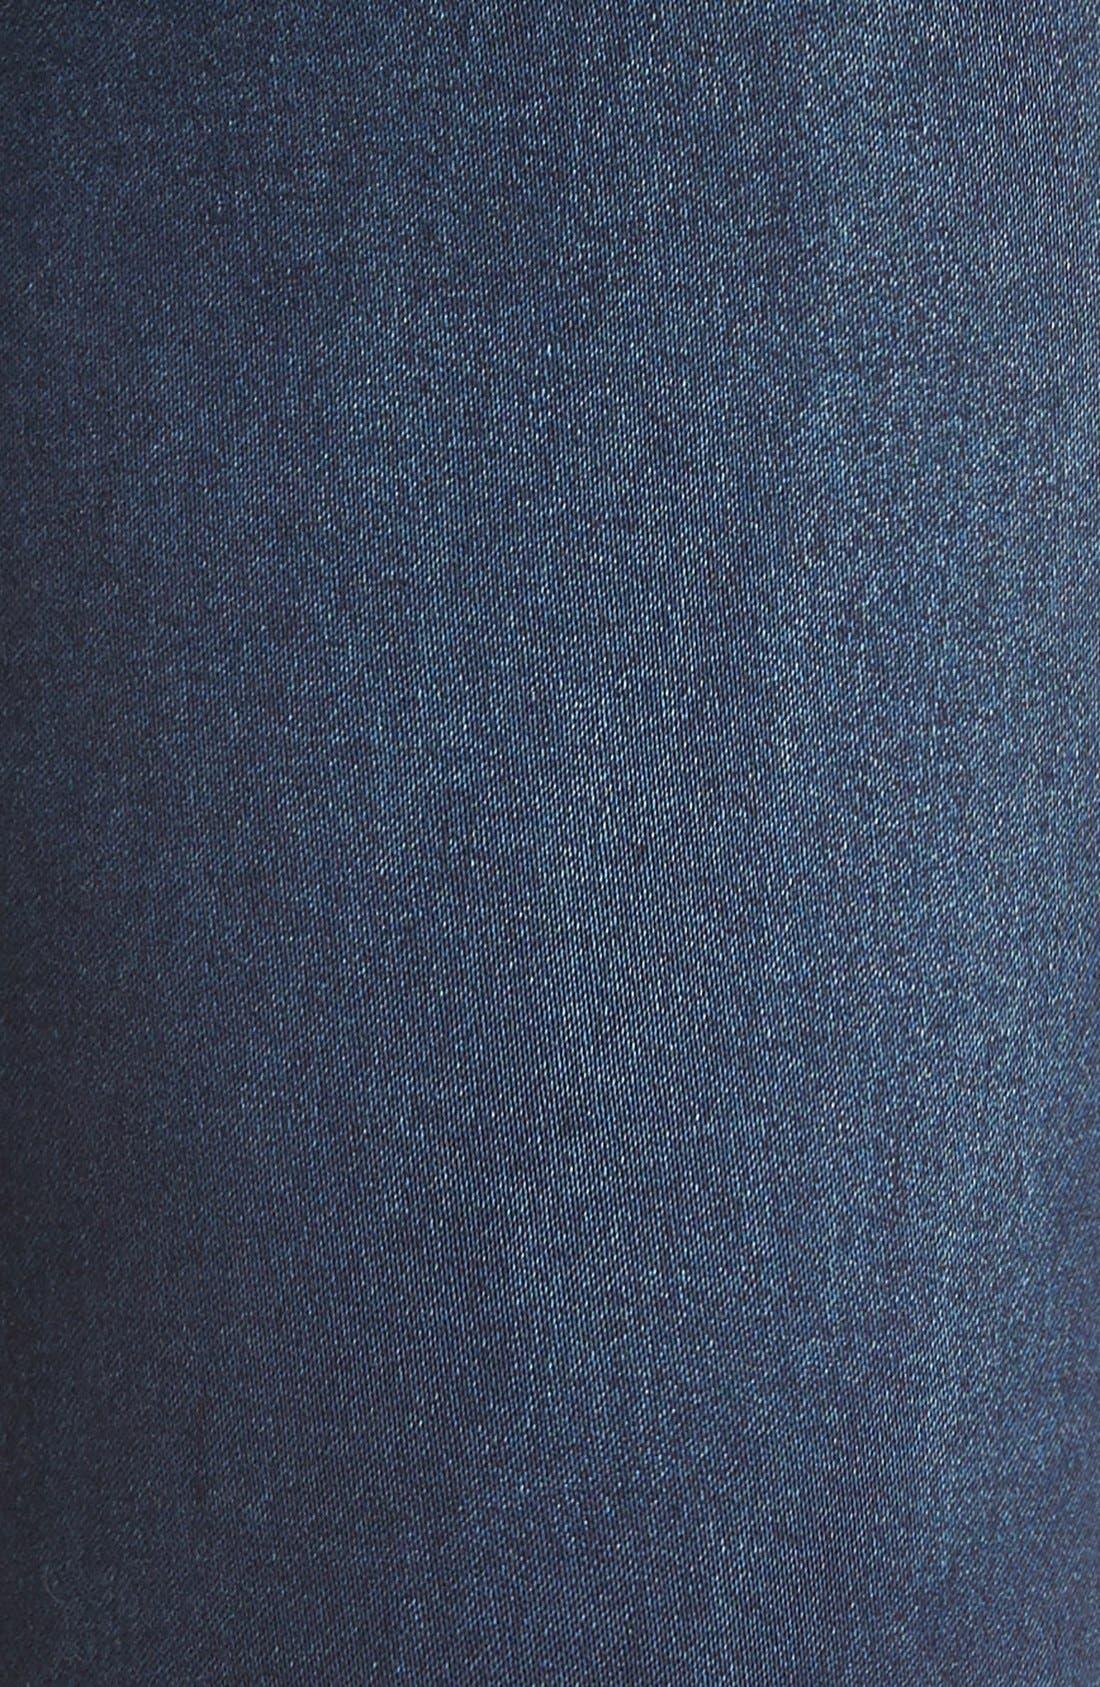 DistressedSkinnyMaternity Jeans,                             Alternate thumbnail 4, color,                             400